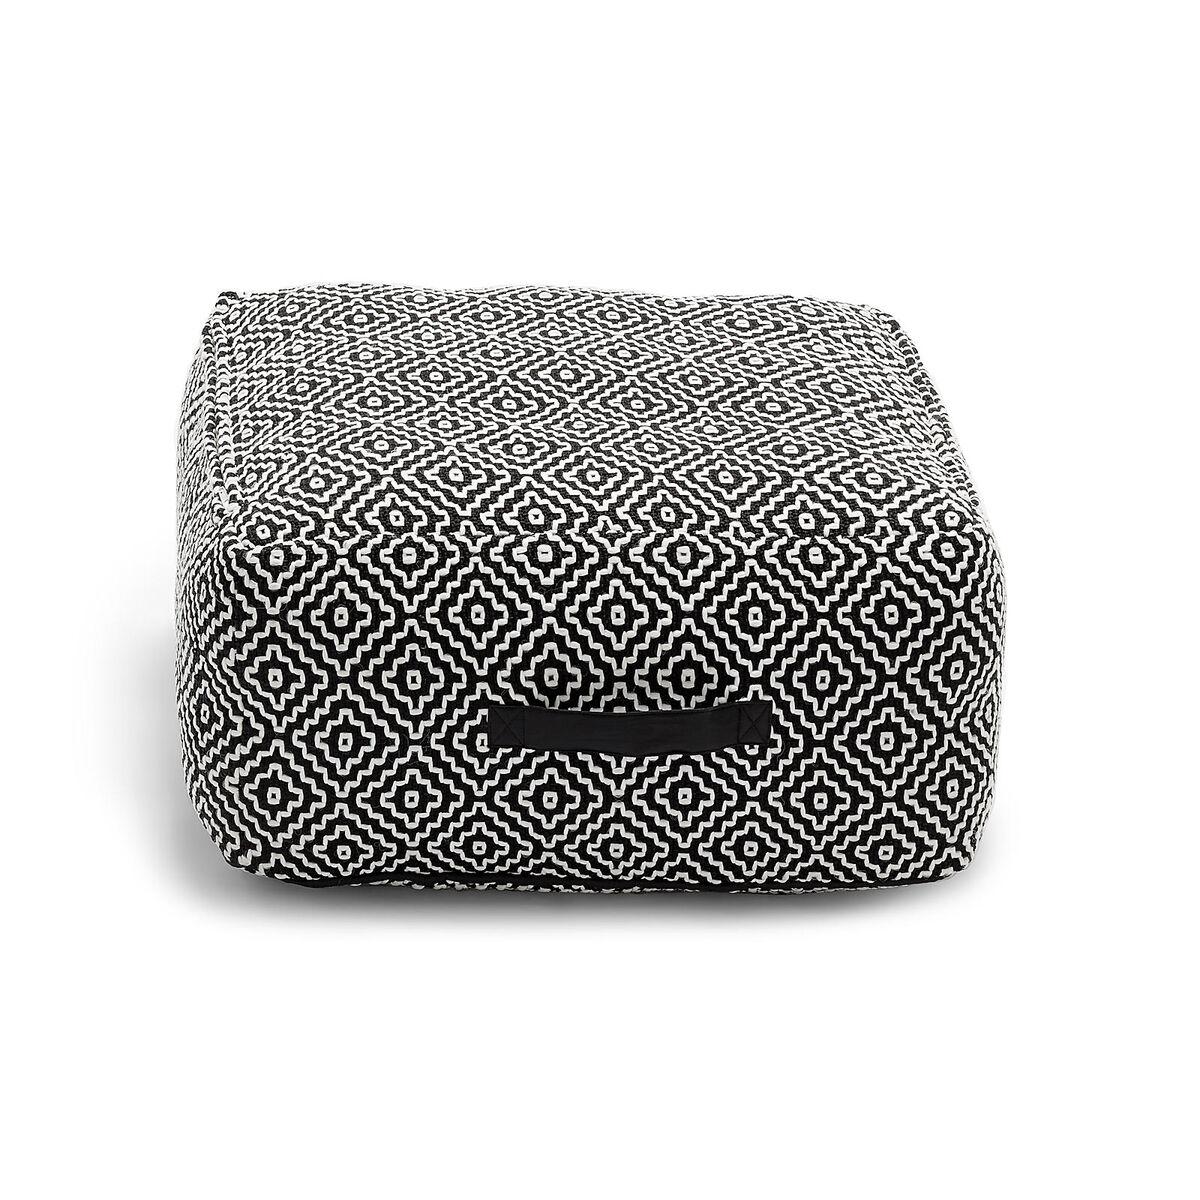 sitzpouf outdoor schwarz ca l 50 x b 50 x h 25 cm depot de. Black Bedroom Furniture Sets. Home Design Ideas